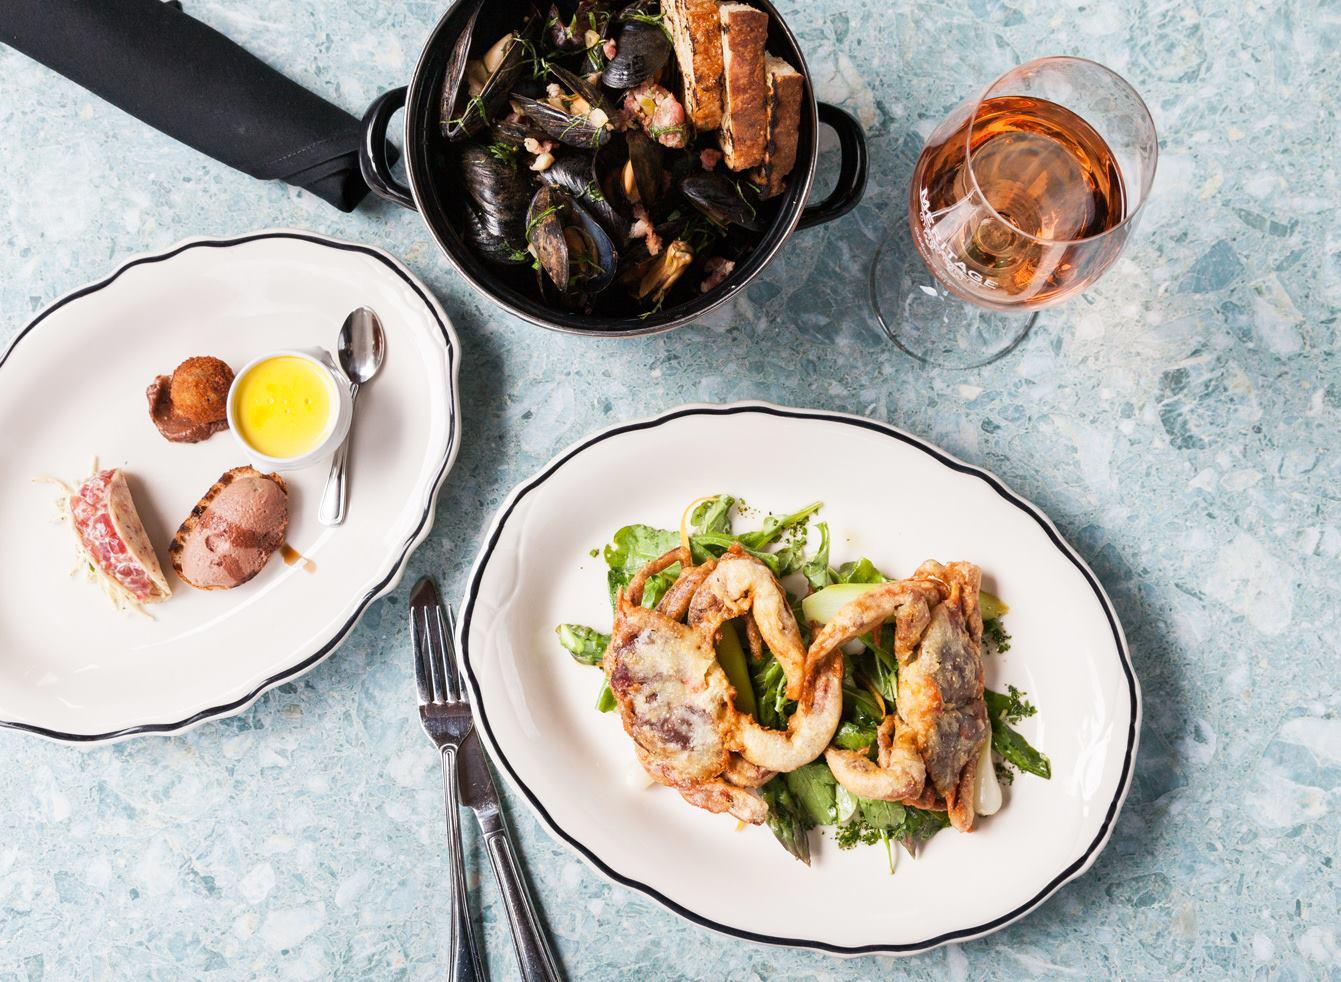 Meritage oyster bar